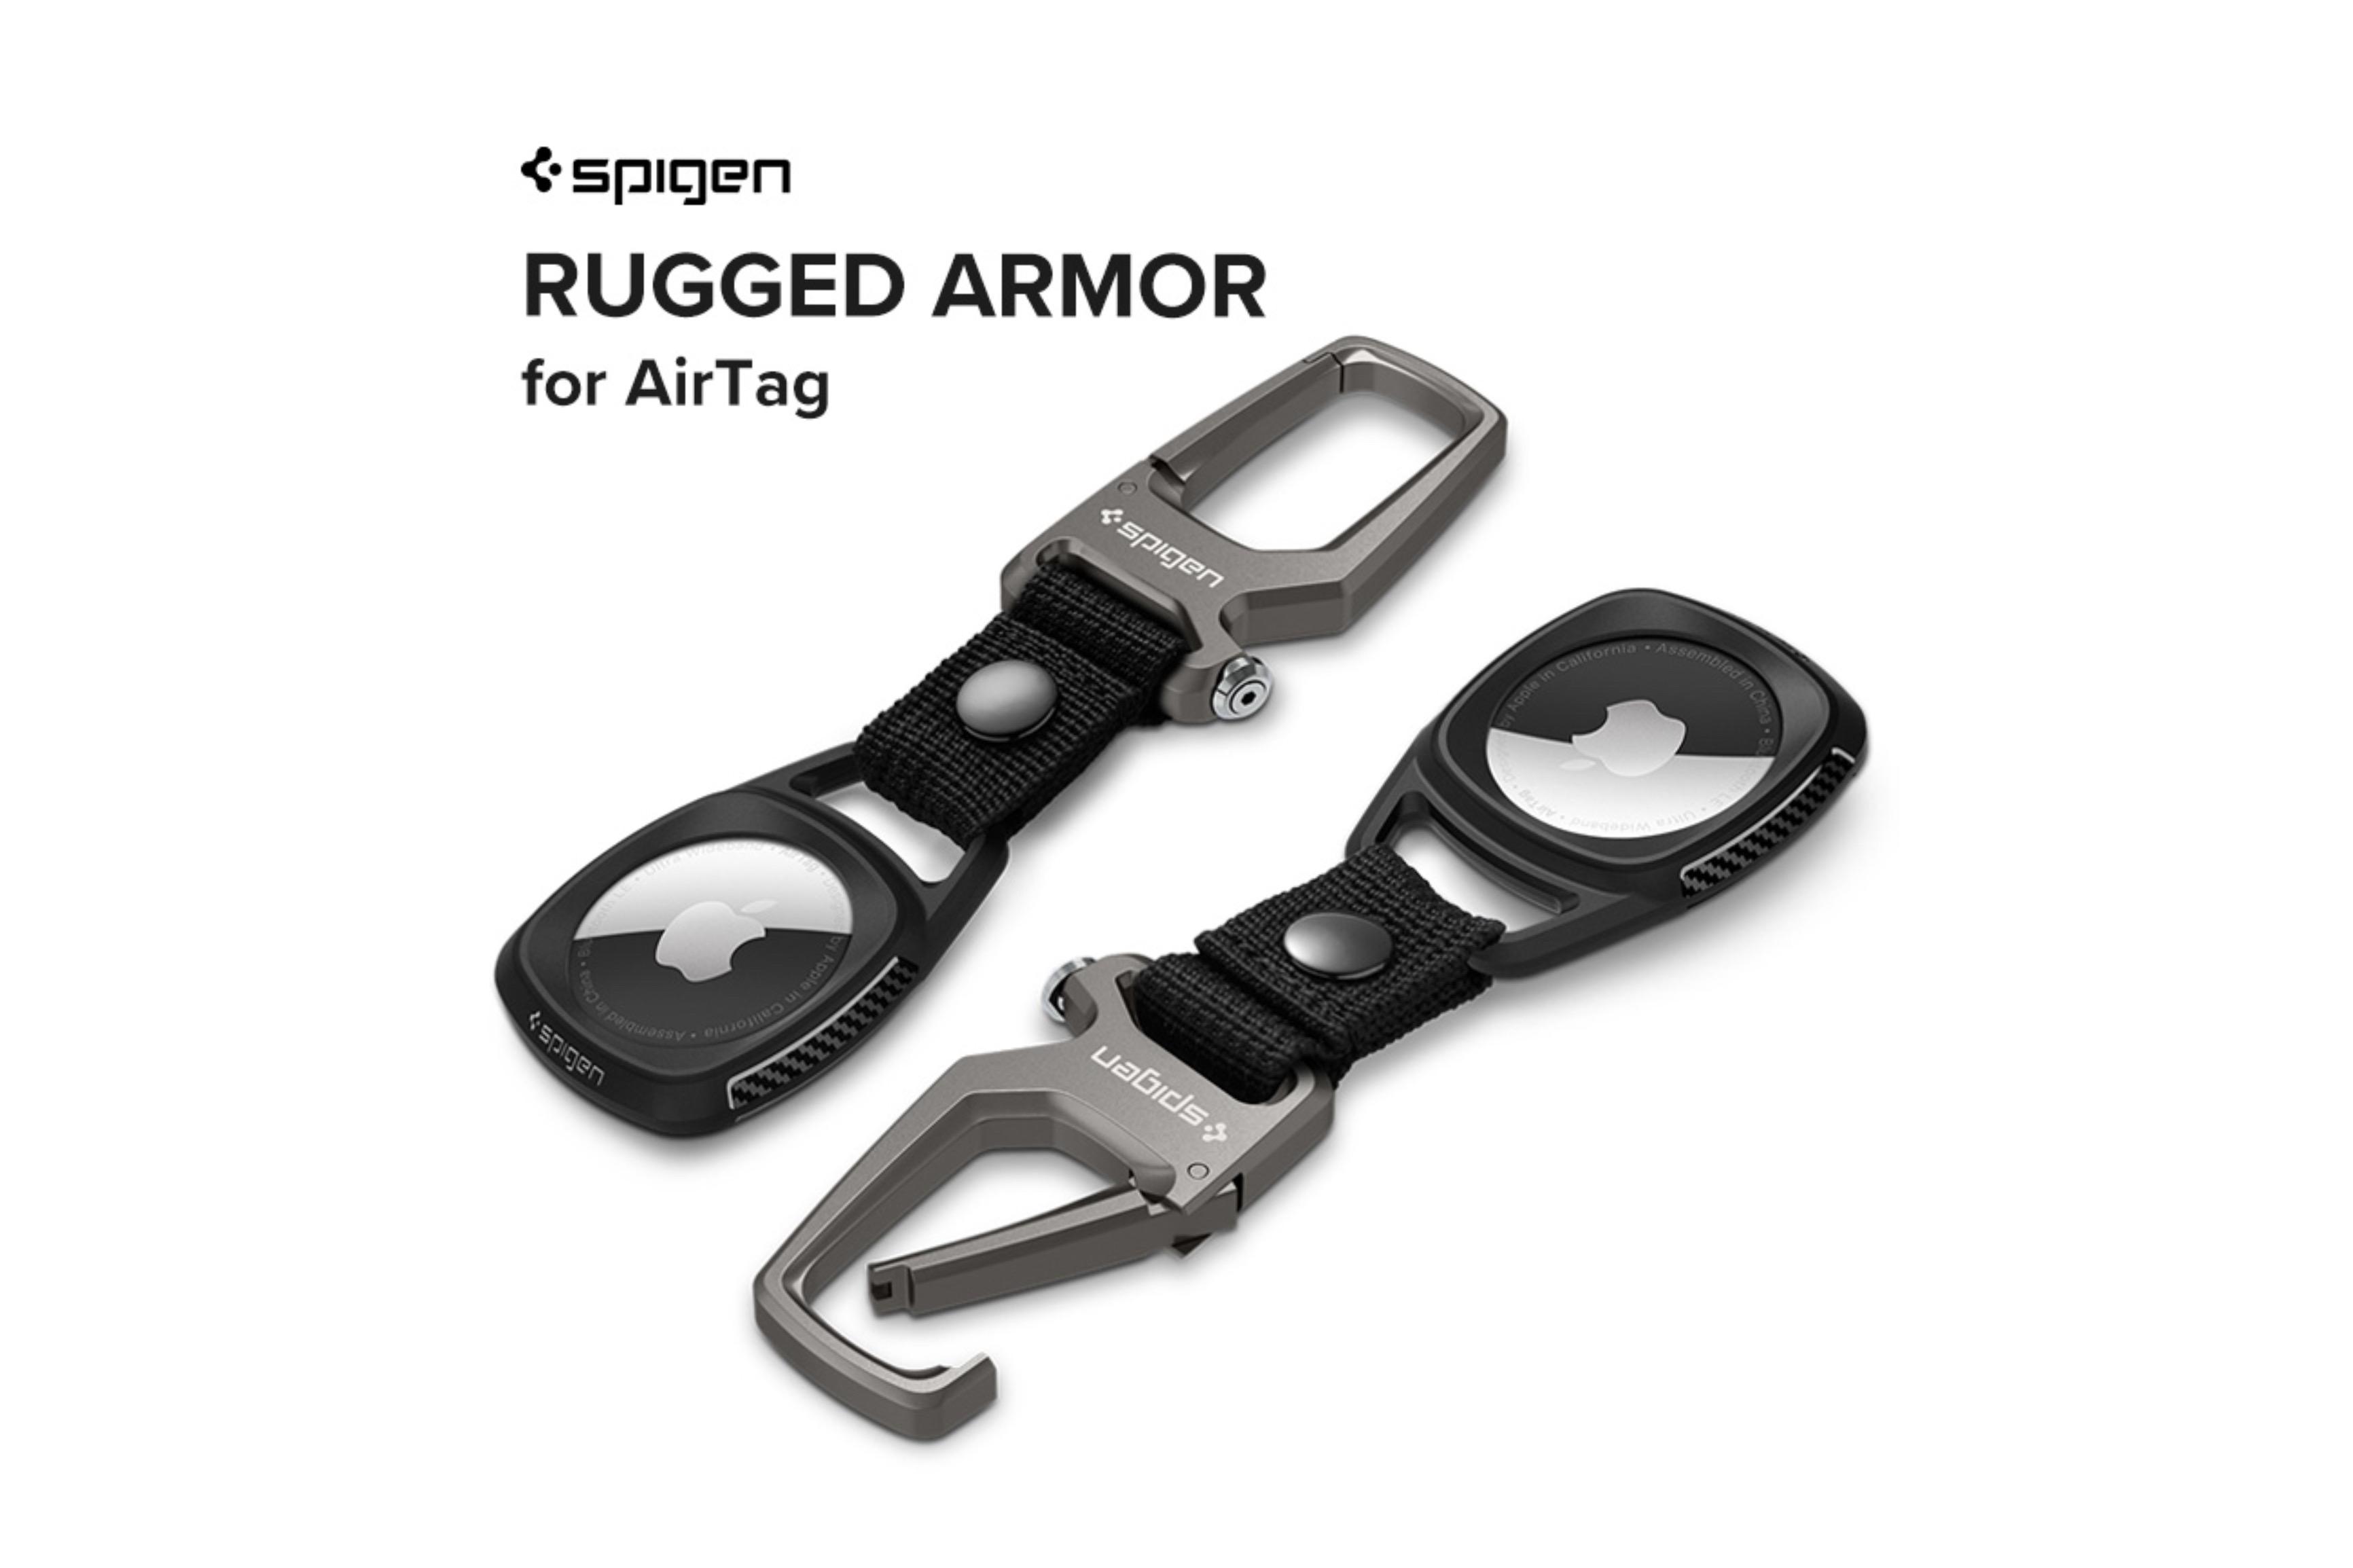 Spigen、栓抜きとしても使えるカラビナ付きAirTag用耐衝撃ケース「ラギッドアーマー」を発売